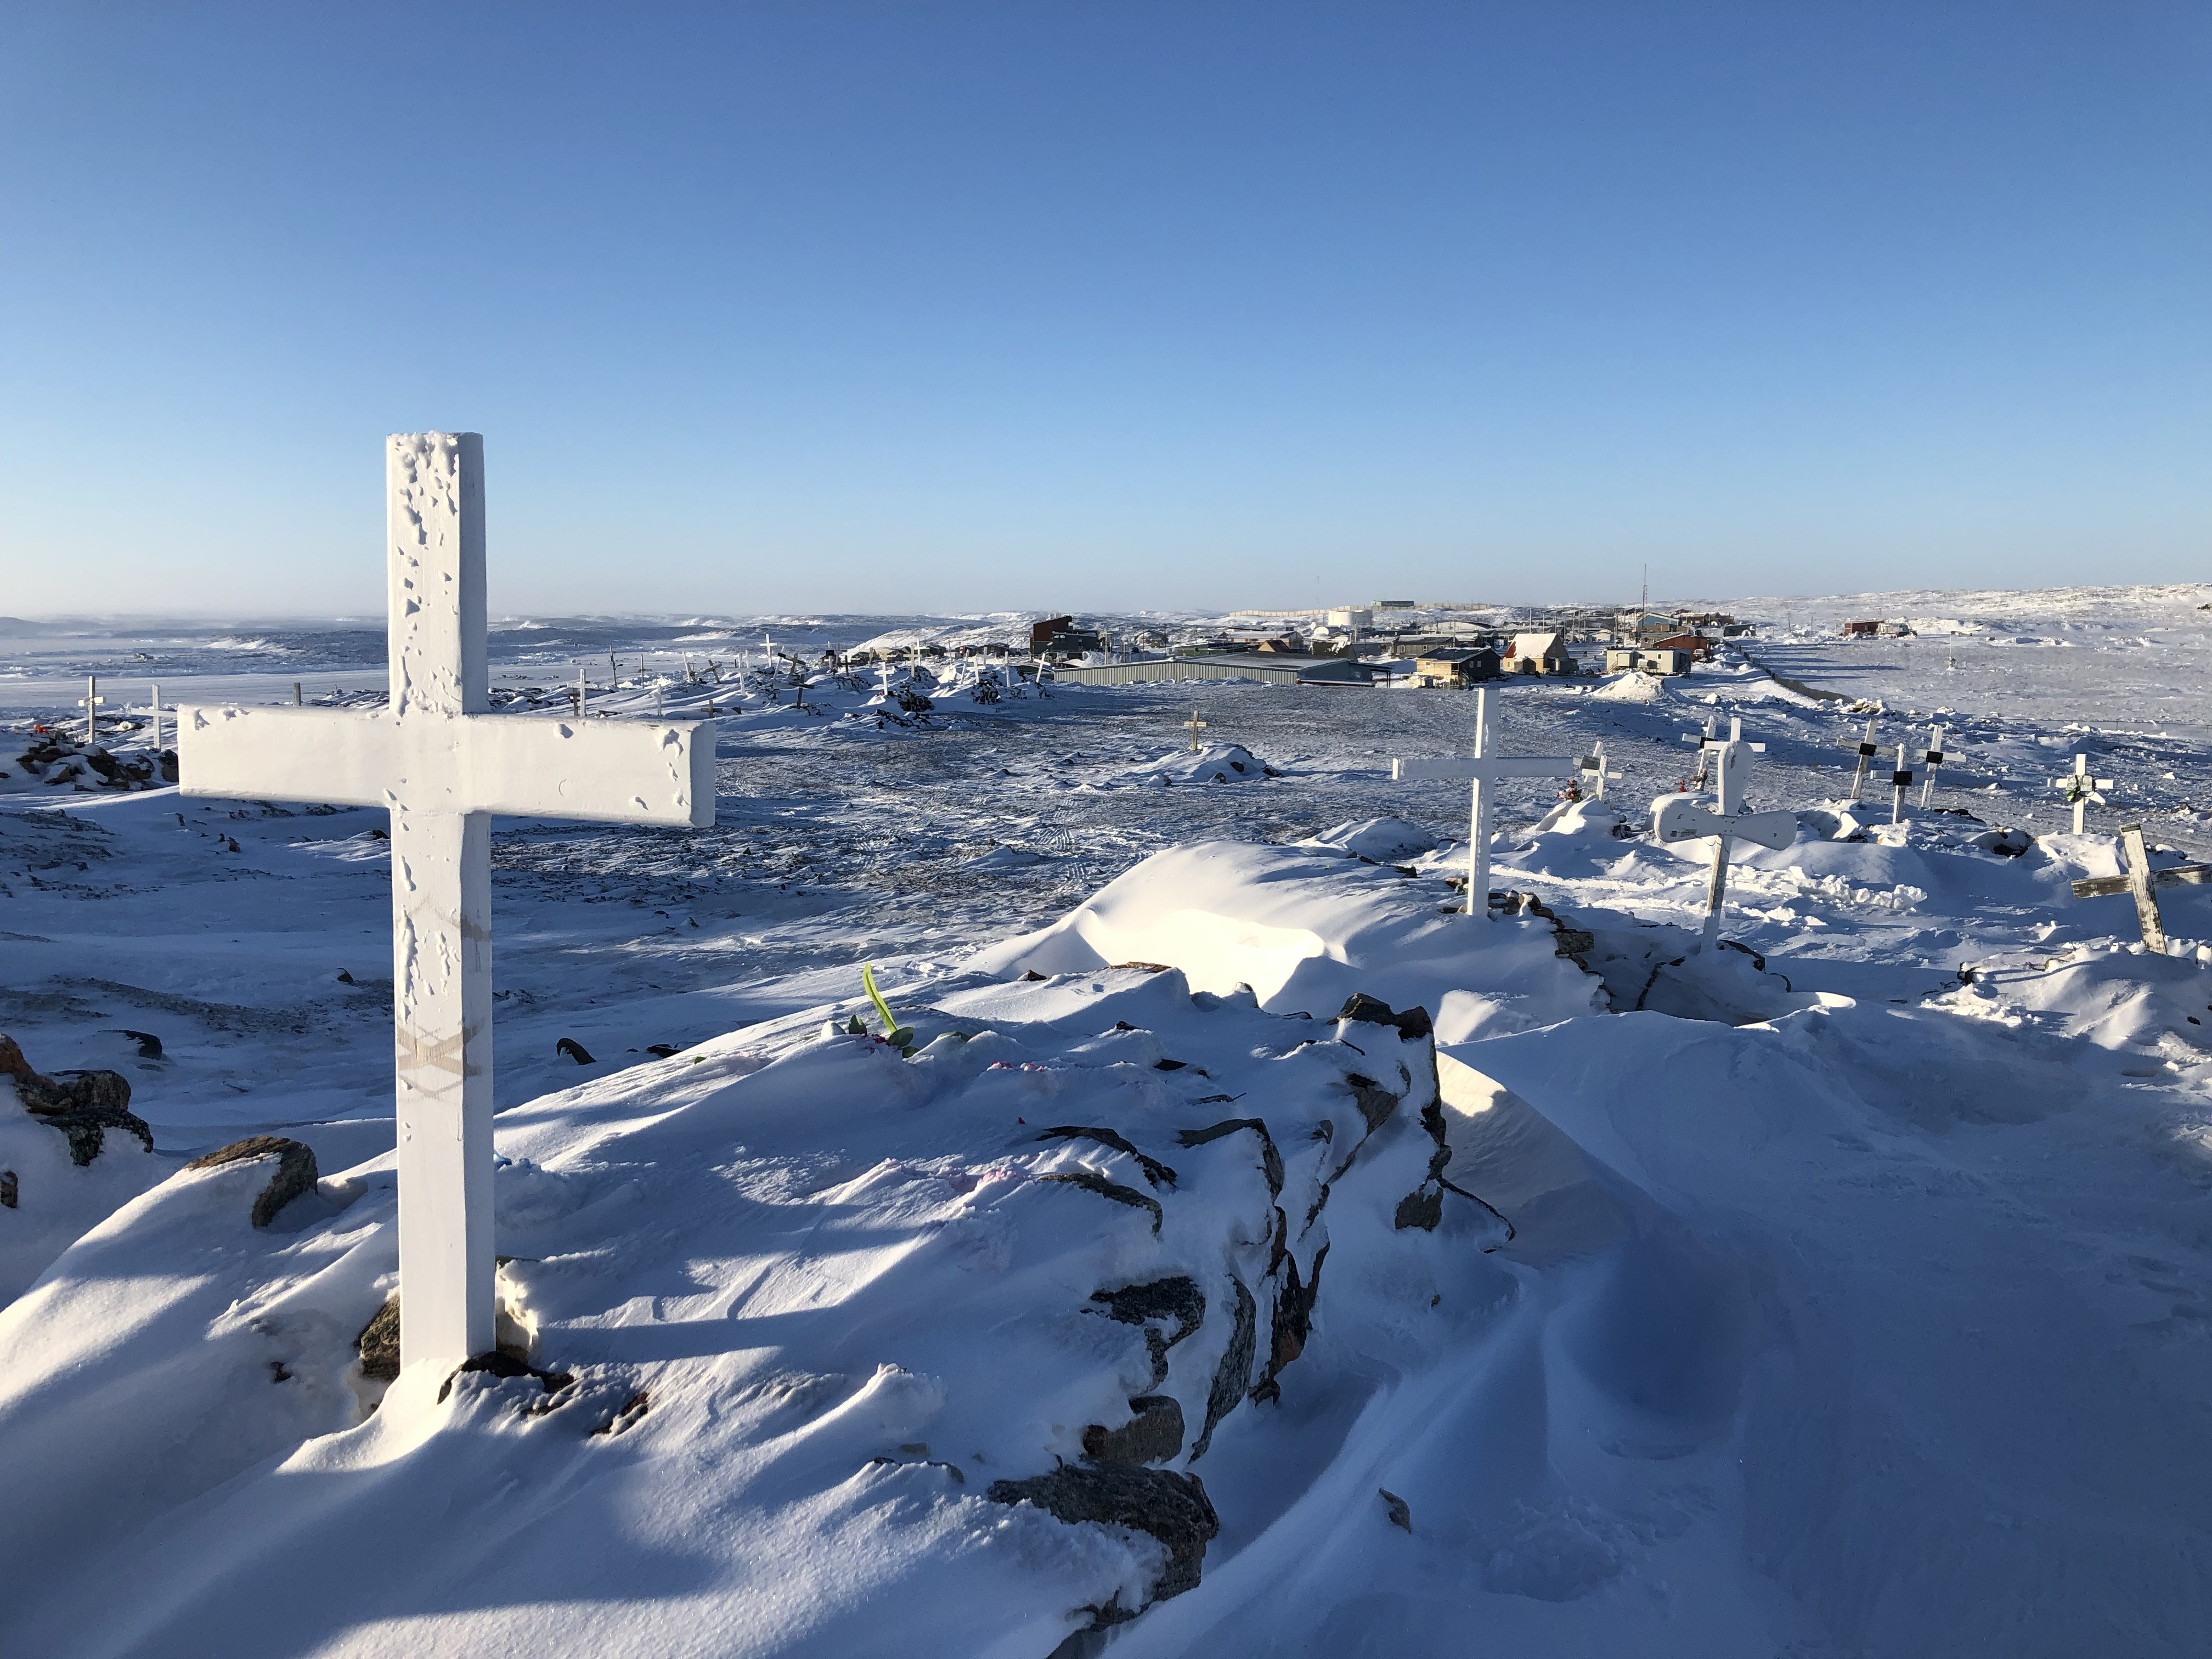 Darryl Kaunak's grave